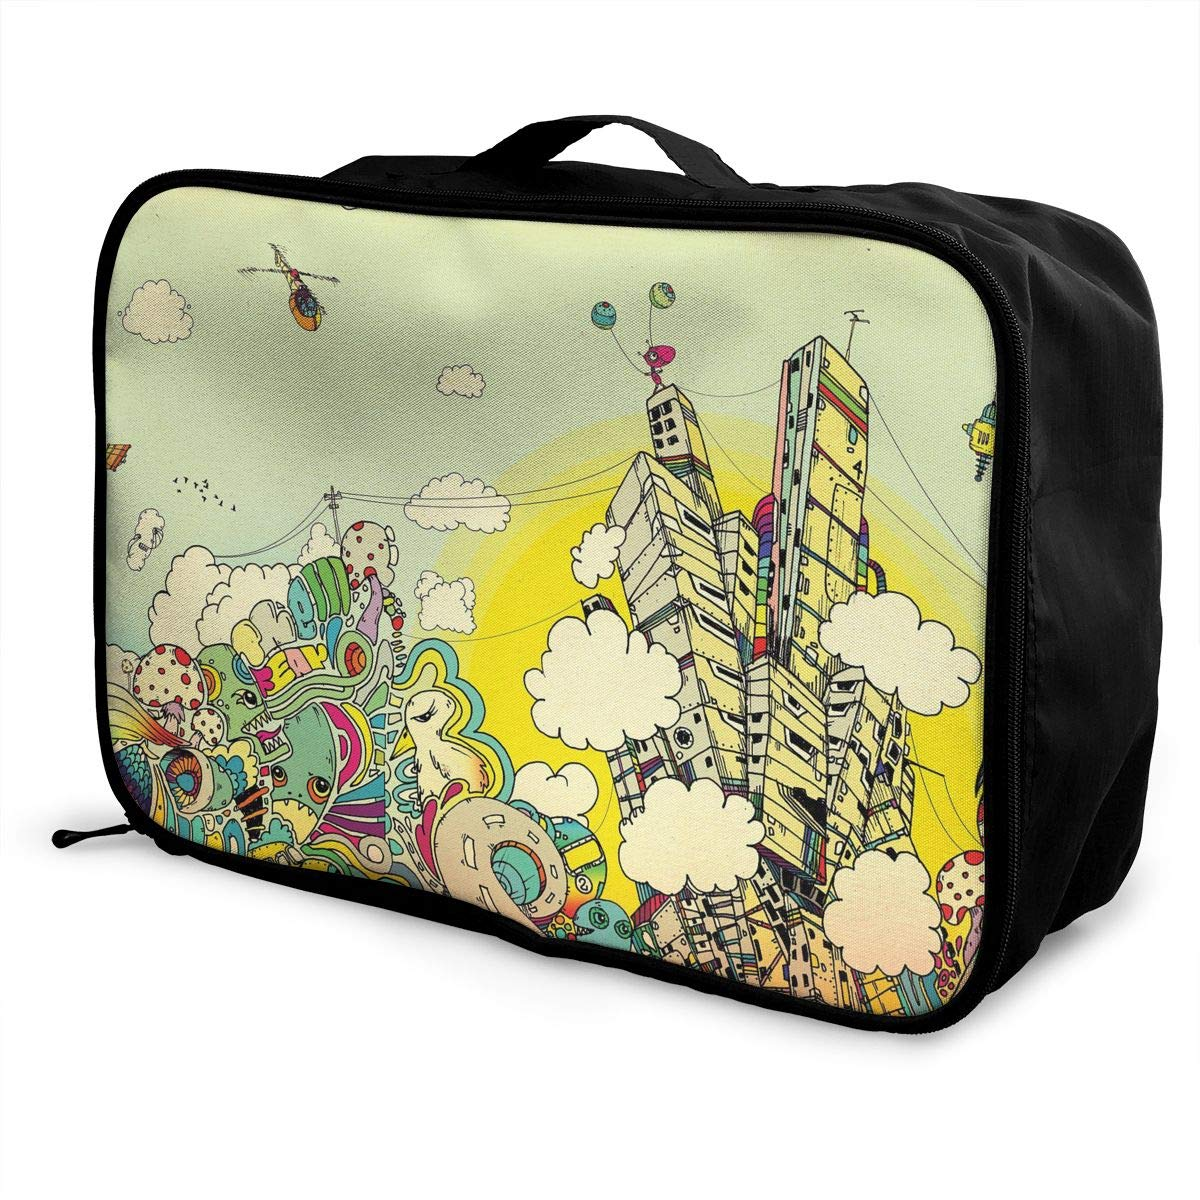 Travel Luggage Duffle Bag Lightweight Portable Handbag Abstract City Large Capacity Waterproof Foldable Storage Tote